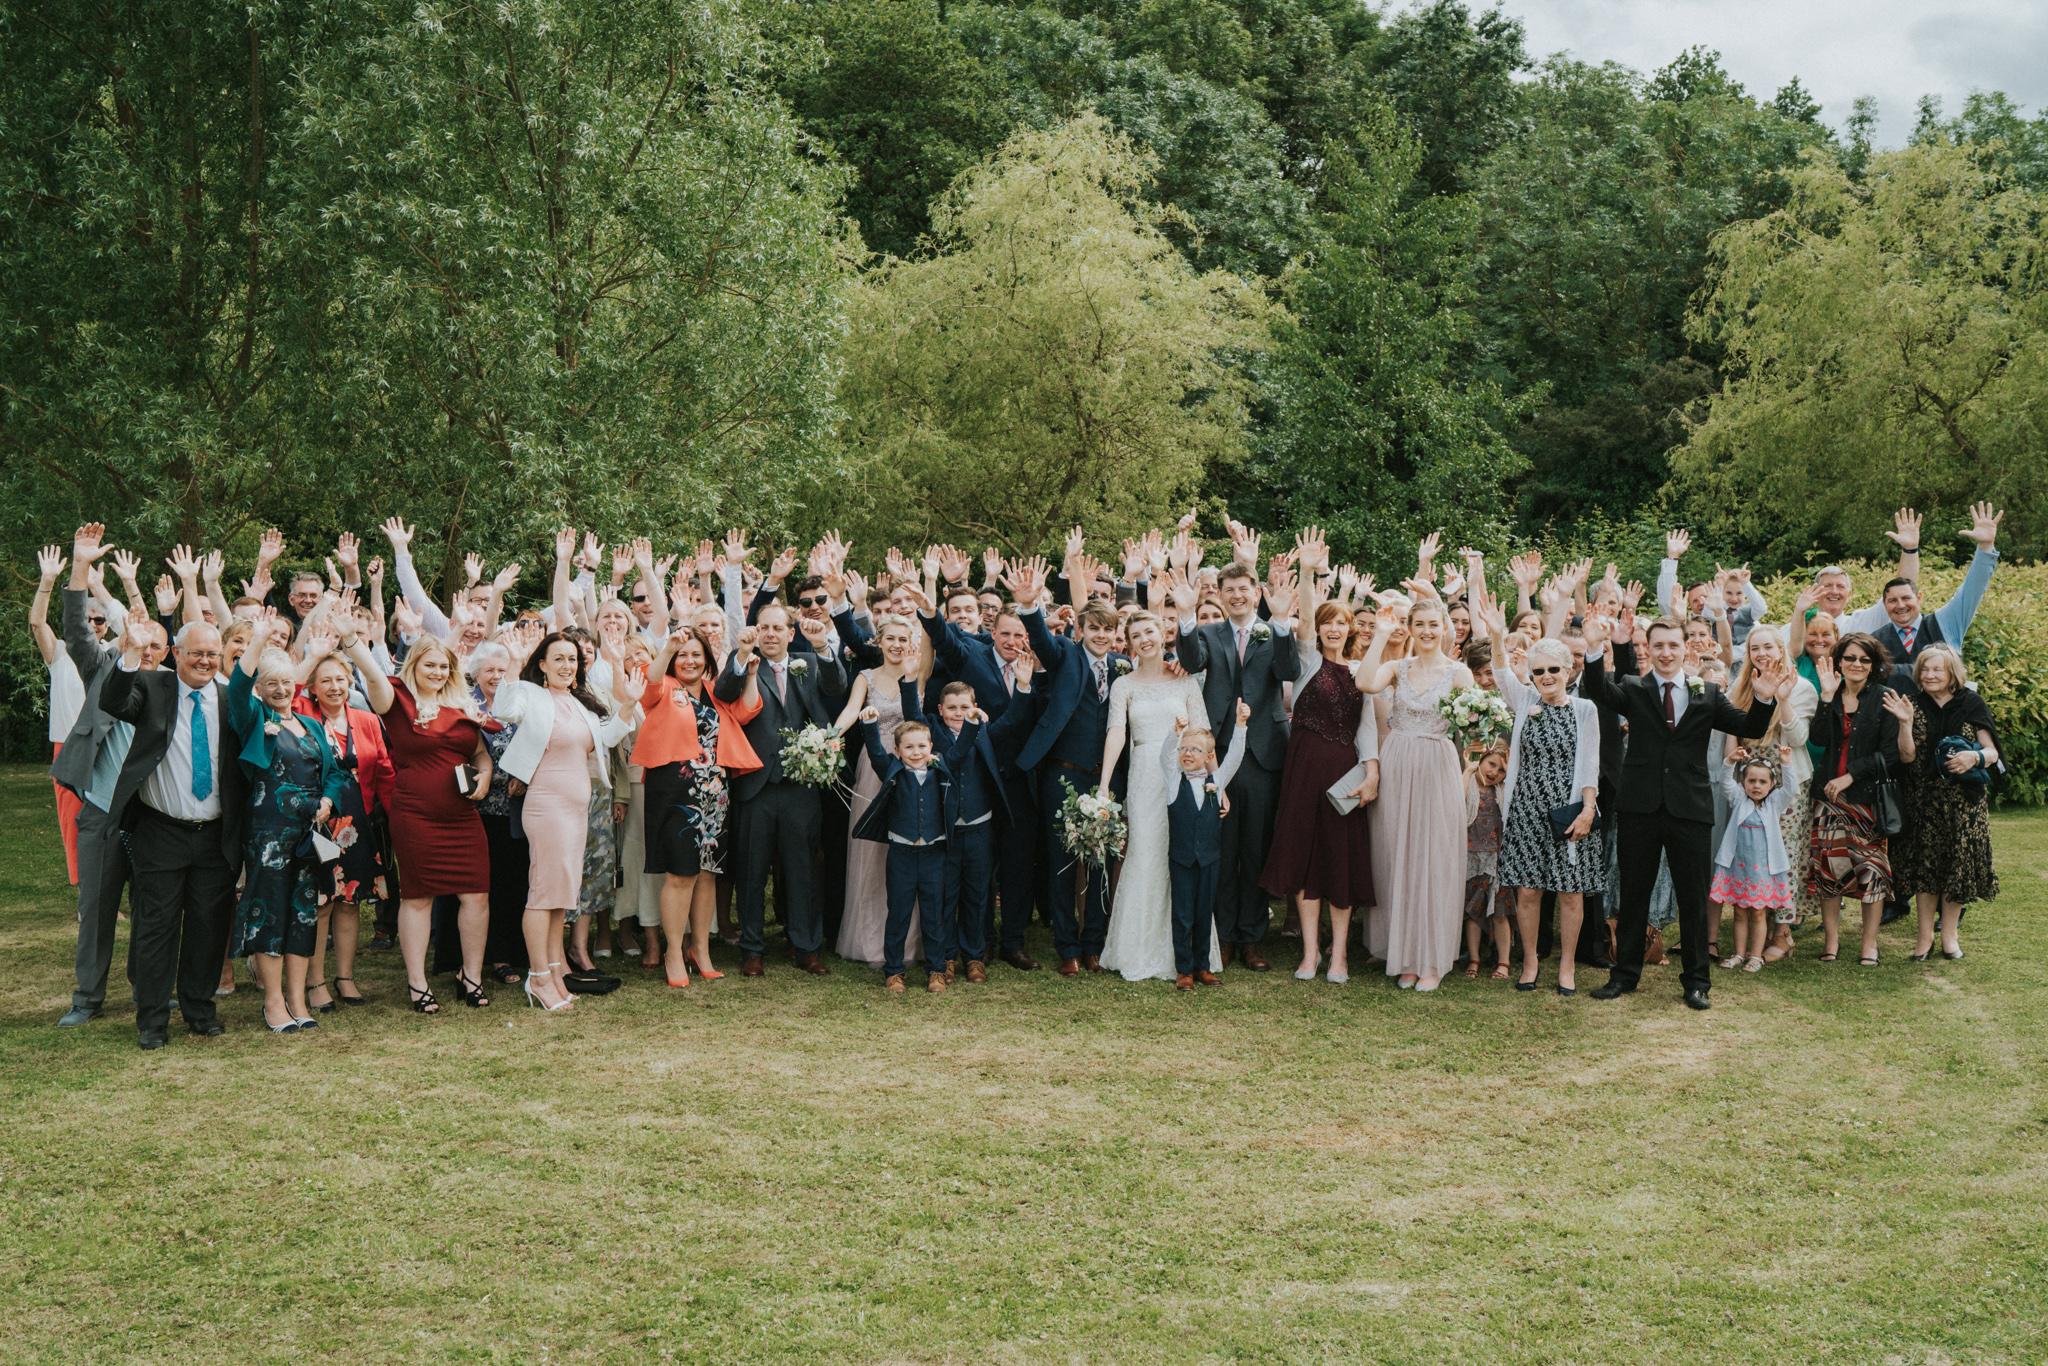 Jess-and-Tom-Norfolk-Alternative-Wedding-Essex-Wedding-Photographer-Grace-Elizabeth-14.jpg